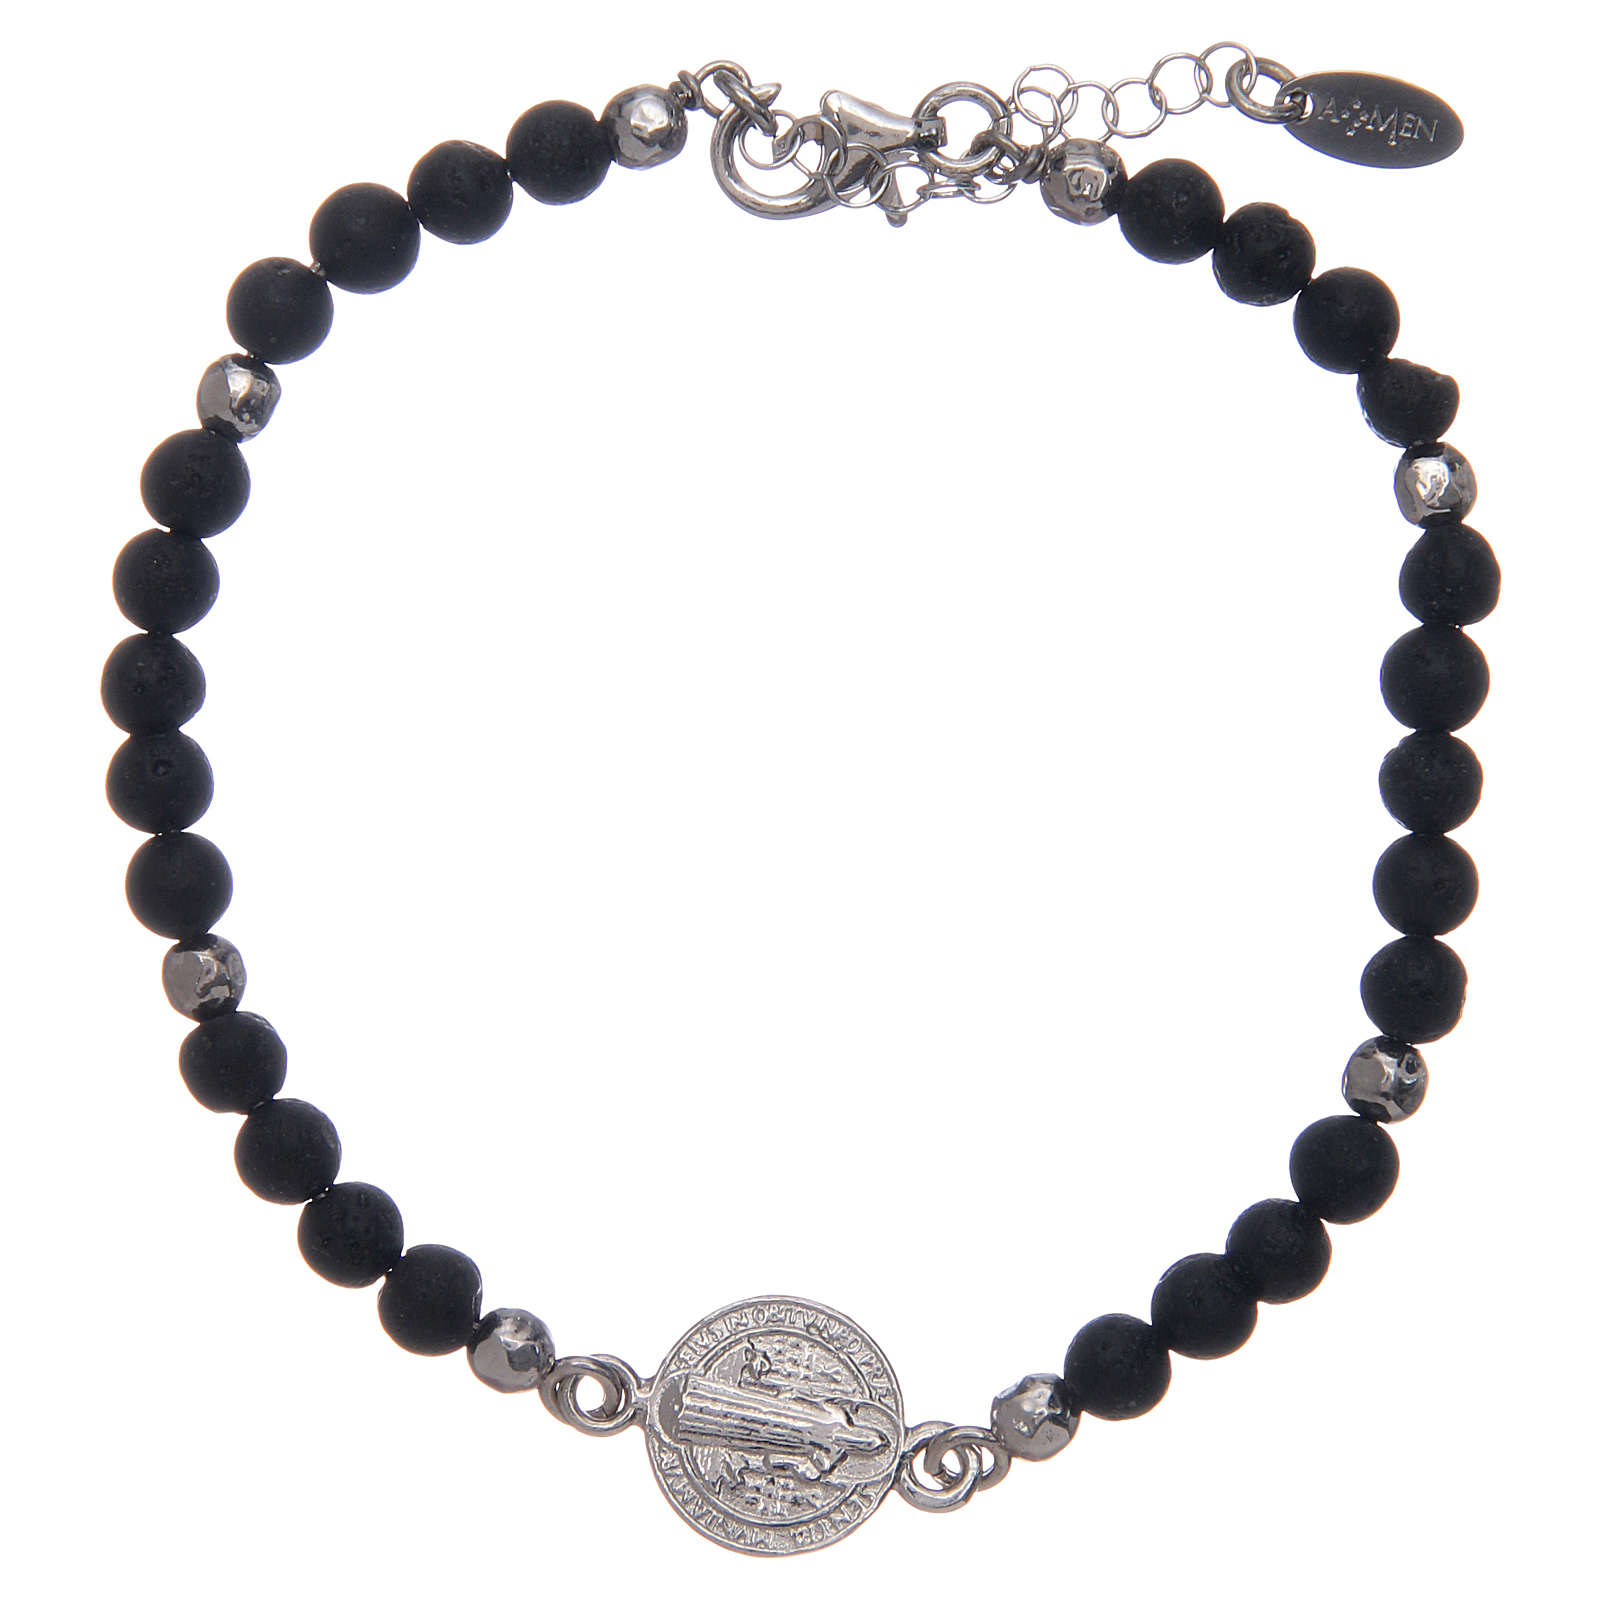 Saint Benedict men's bracelet with lava stone beads, AMEN 4